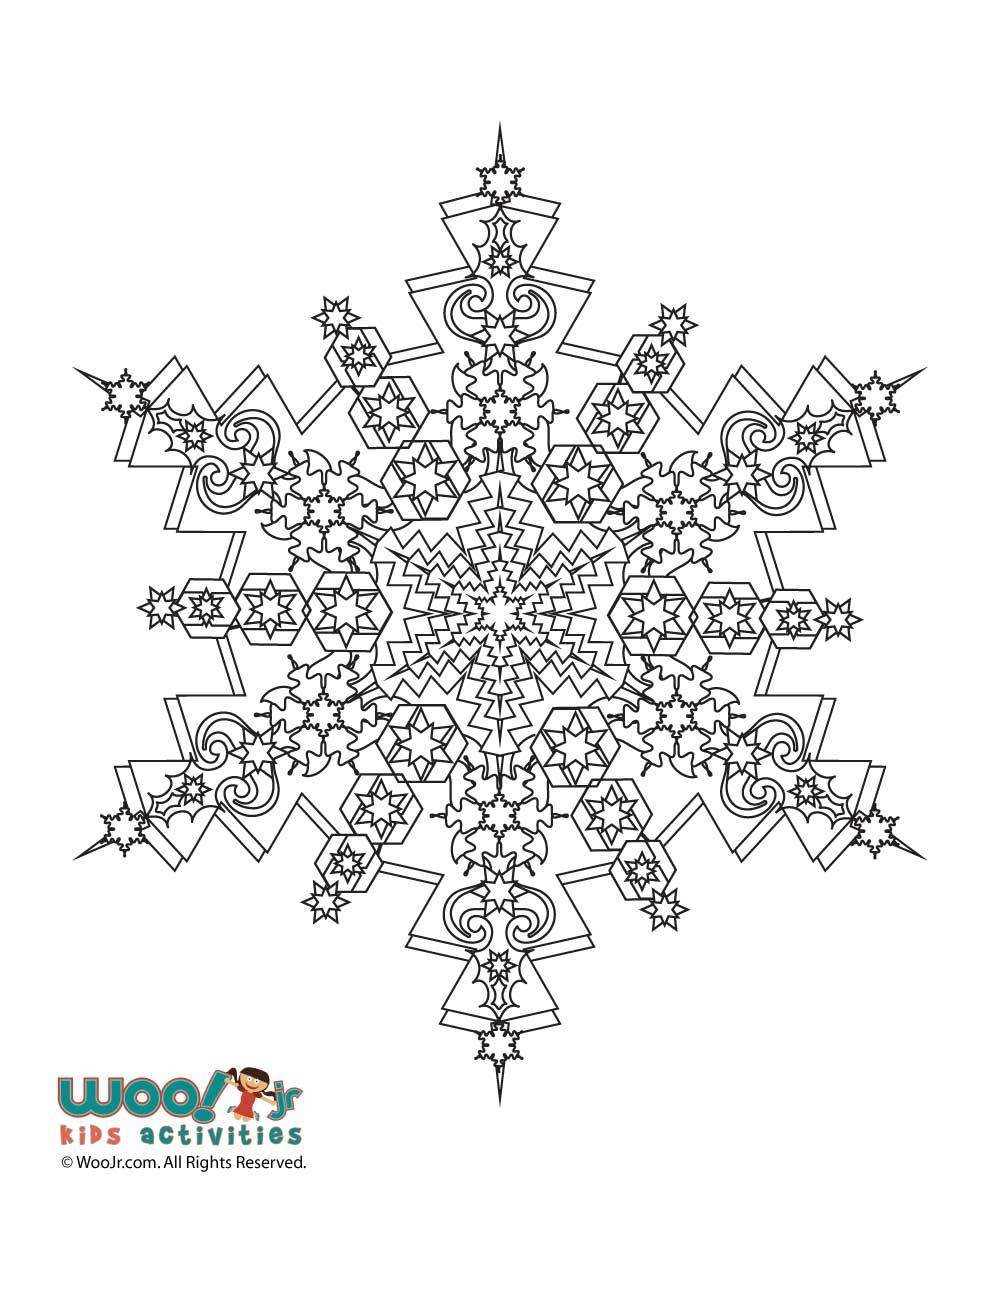 Snowflake Mandala : snowflake, mandala, Snowflake, Mandala, Winter, Adult, Coloring, Activities